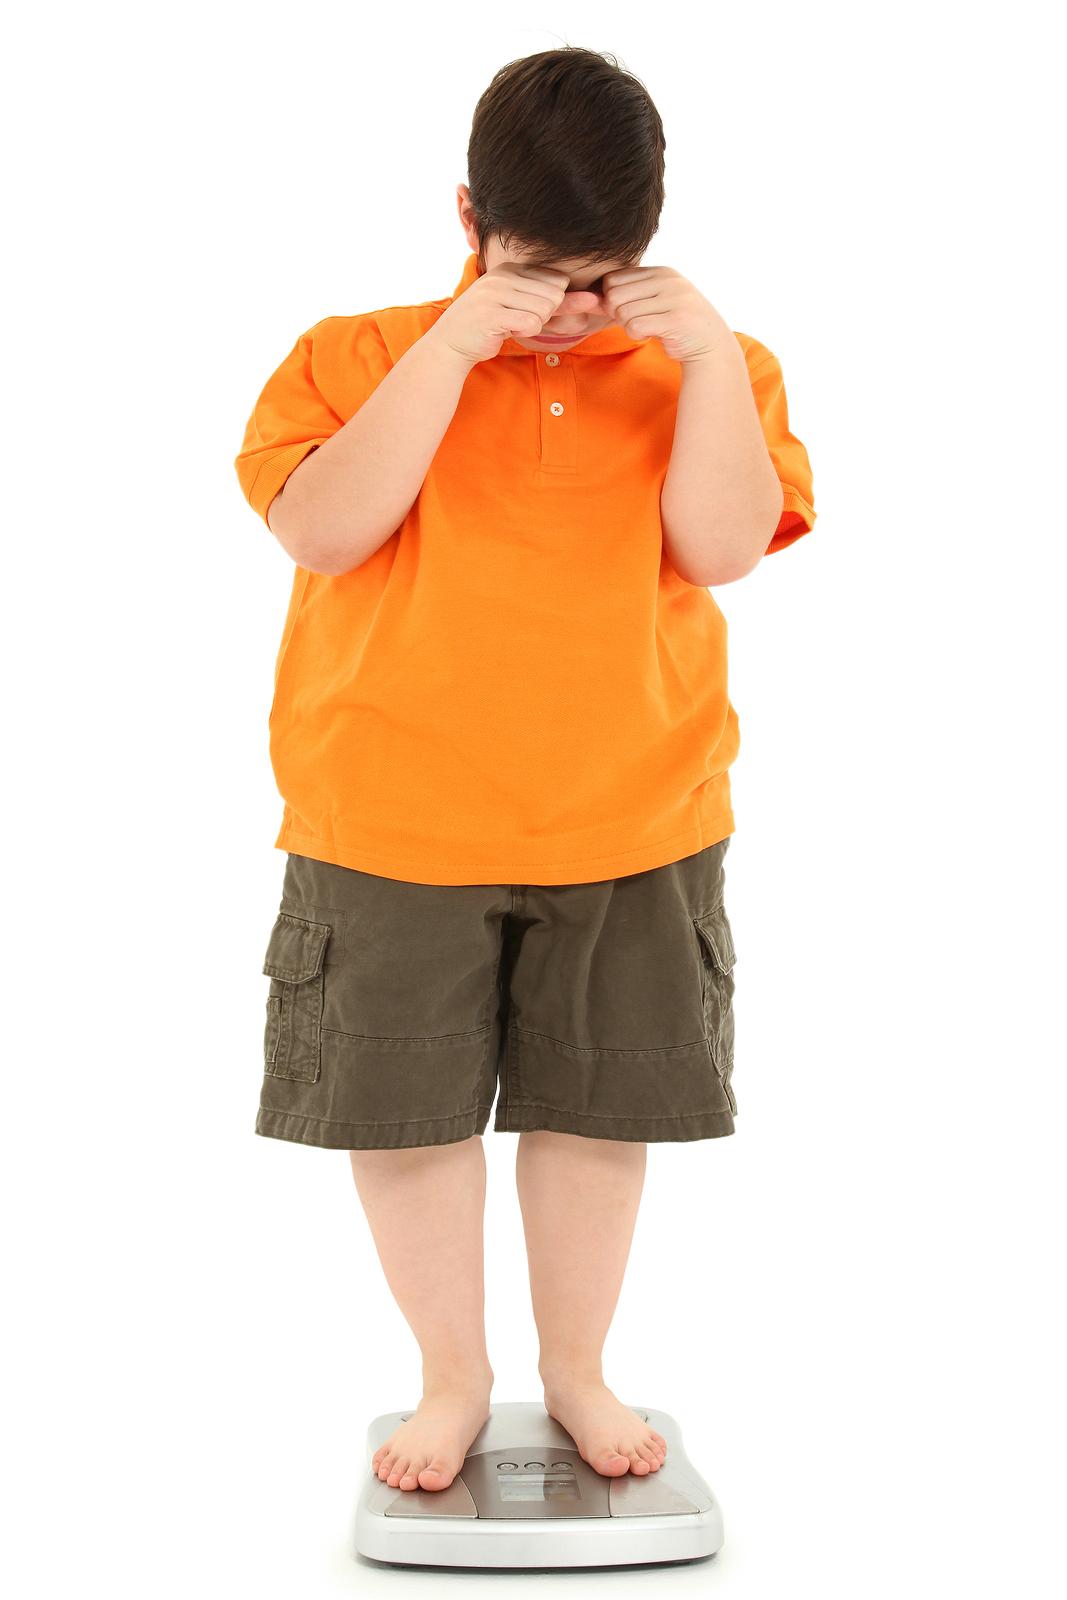 bigstock-Fat-Child-On-Sc-21276017.jpg